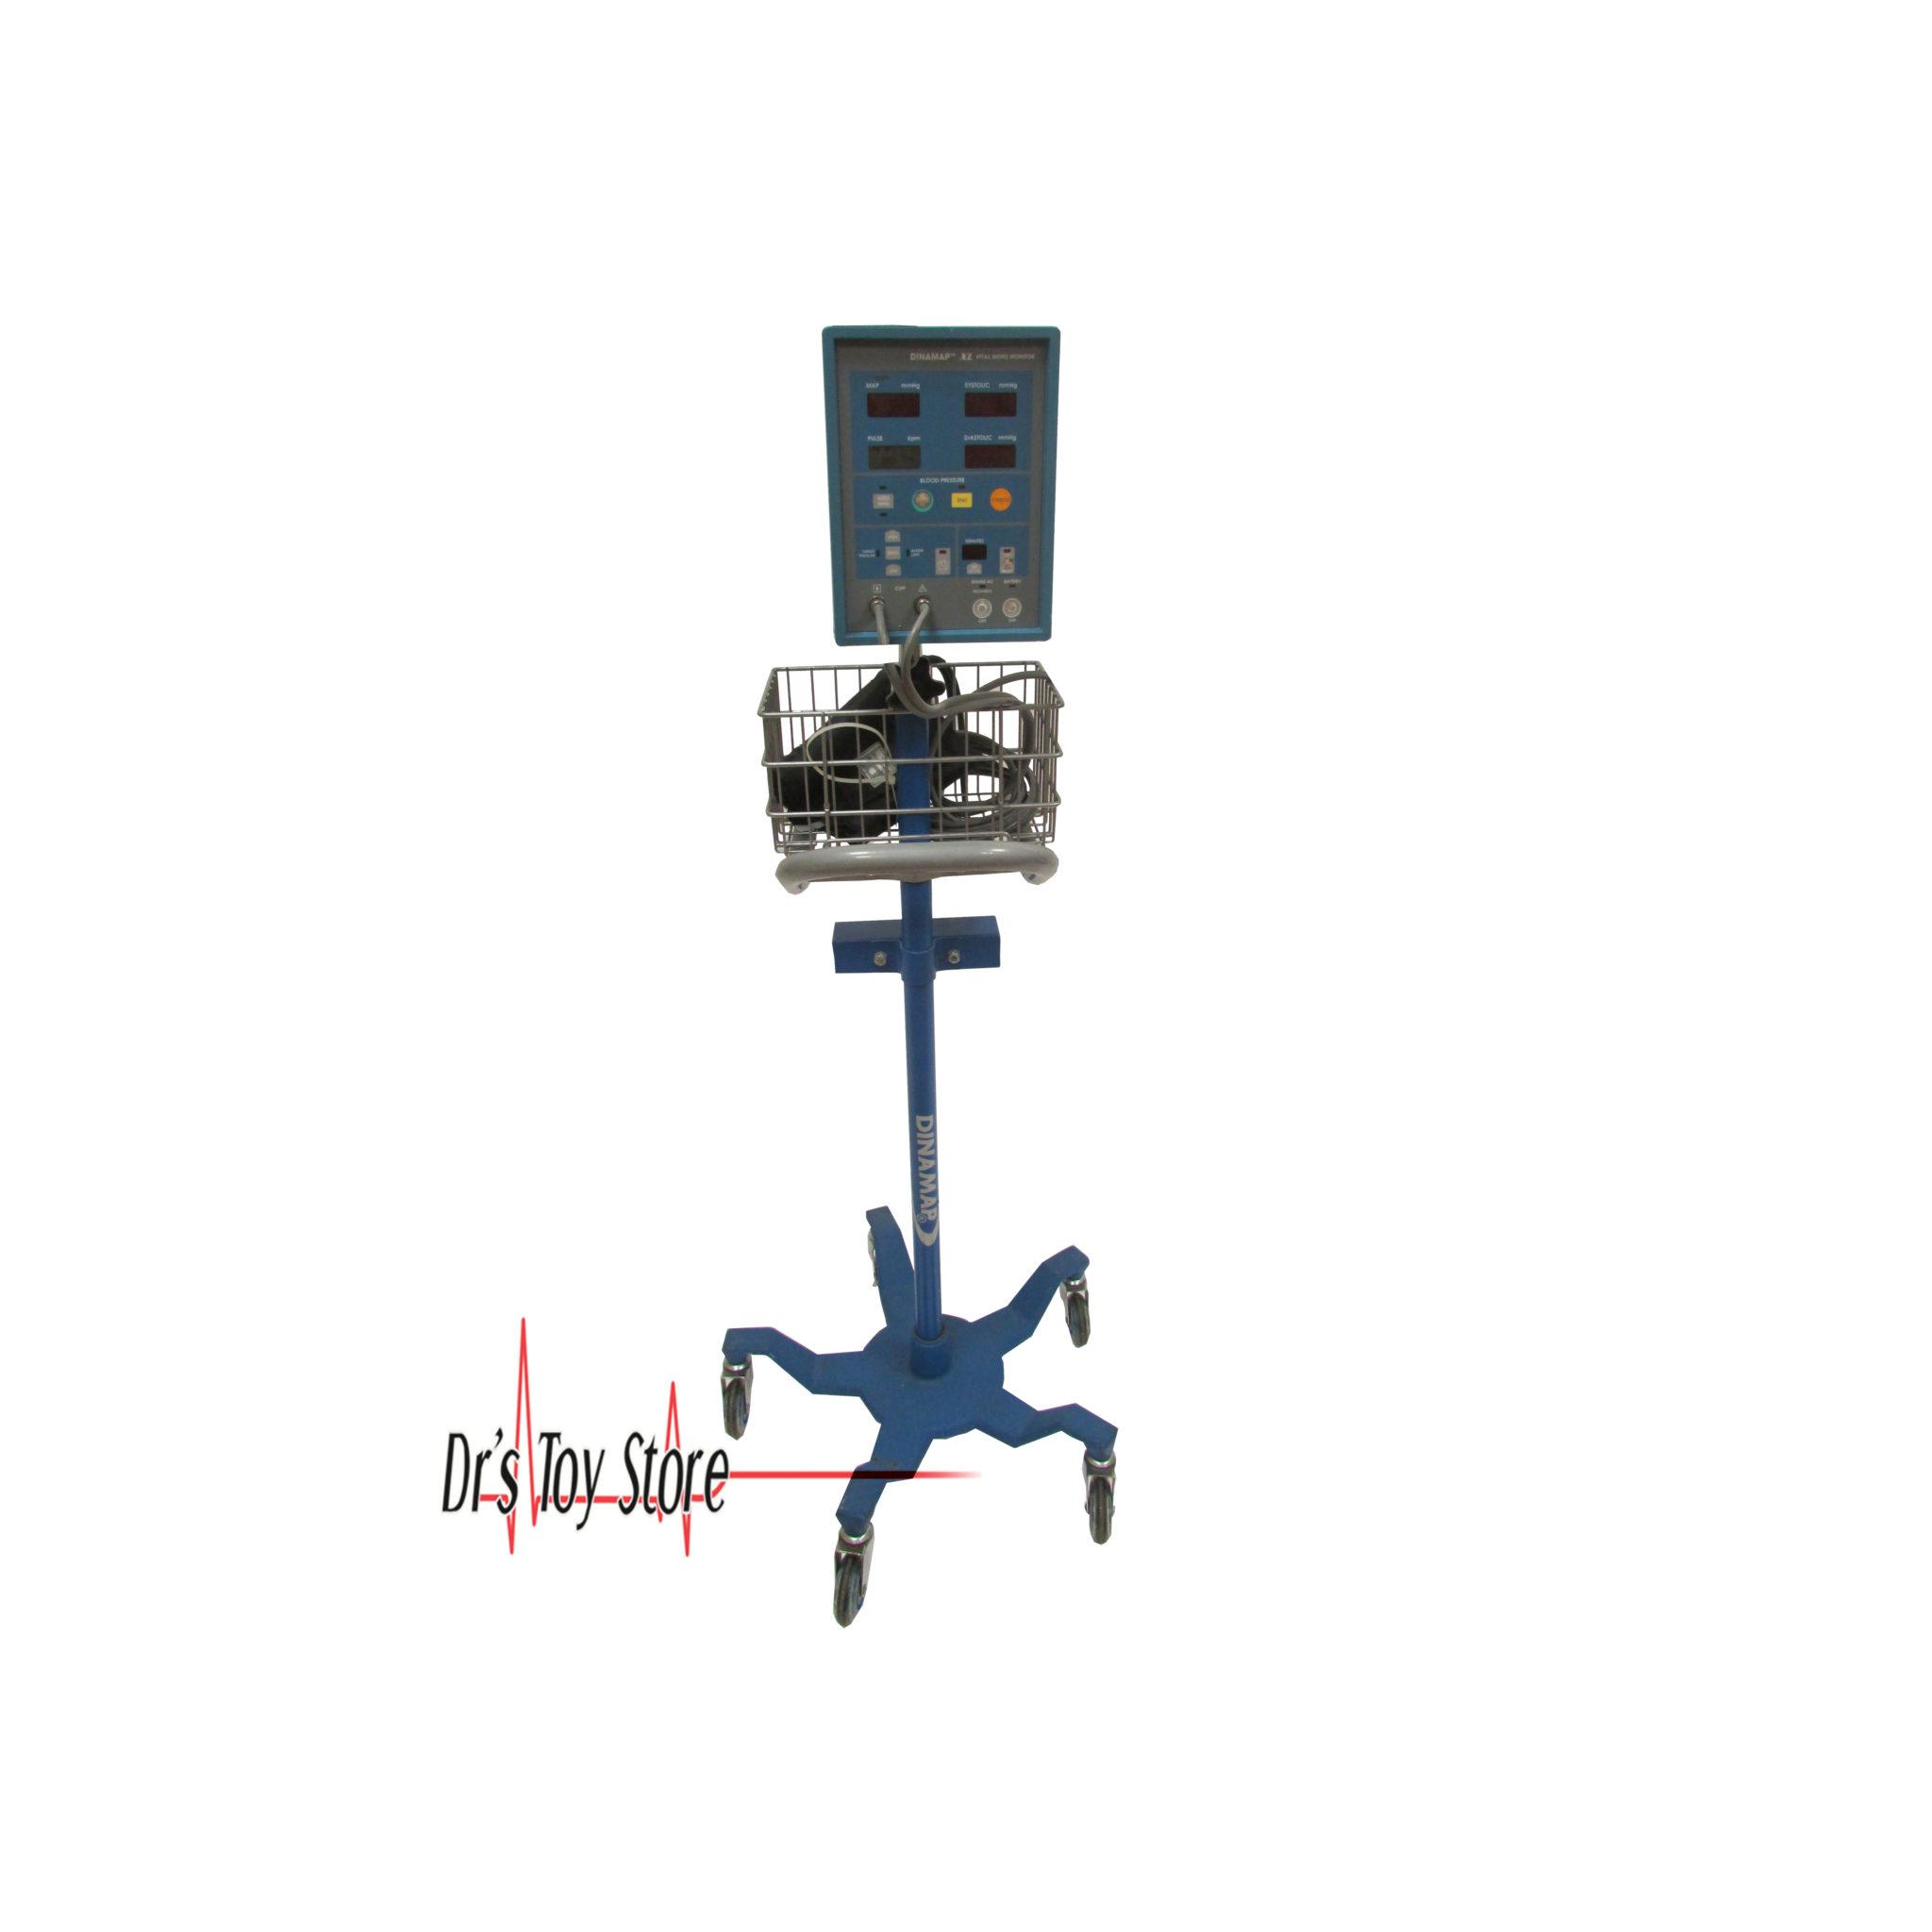 Critikon Dinamap Xl Nibp Blood Pressure Monitor New And Used Medical Equipment And Repairs